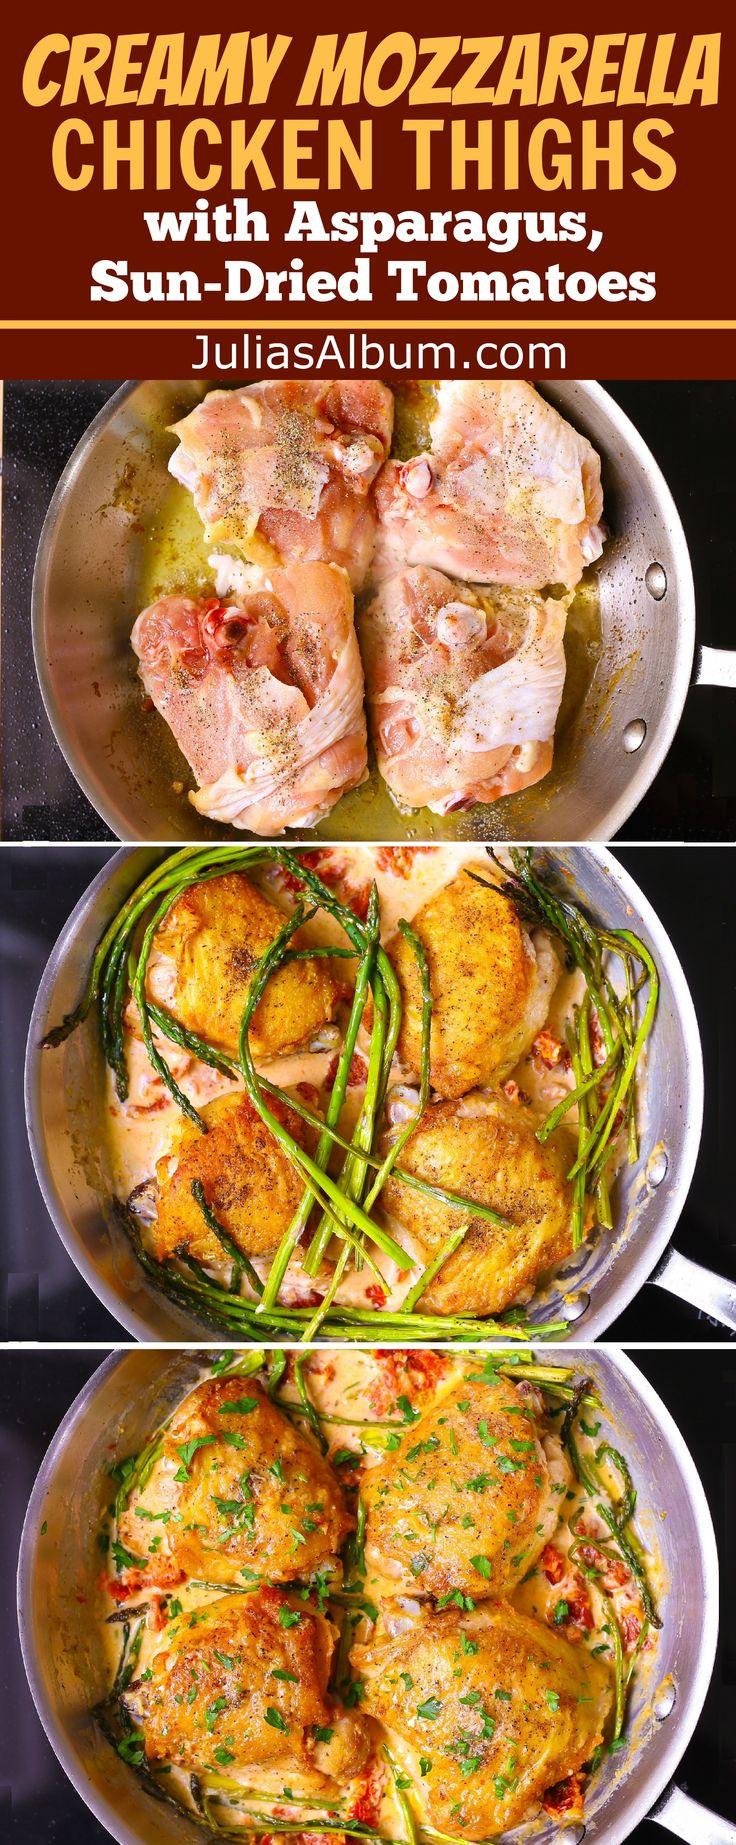 Creamy Mozzarella Chicken Thighs with Asparagus, Sun-Dried Tomatoes. Chicken dinner recipe ideas.